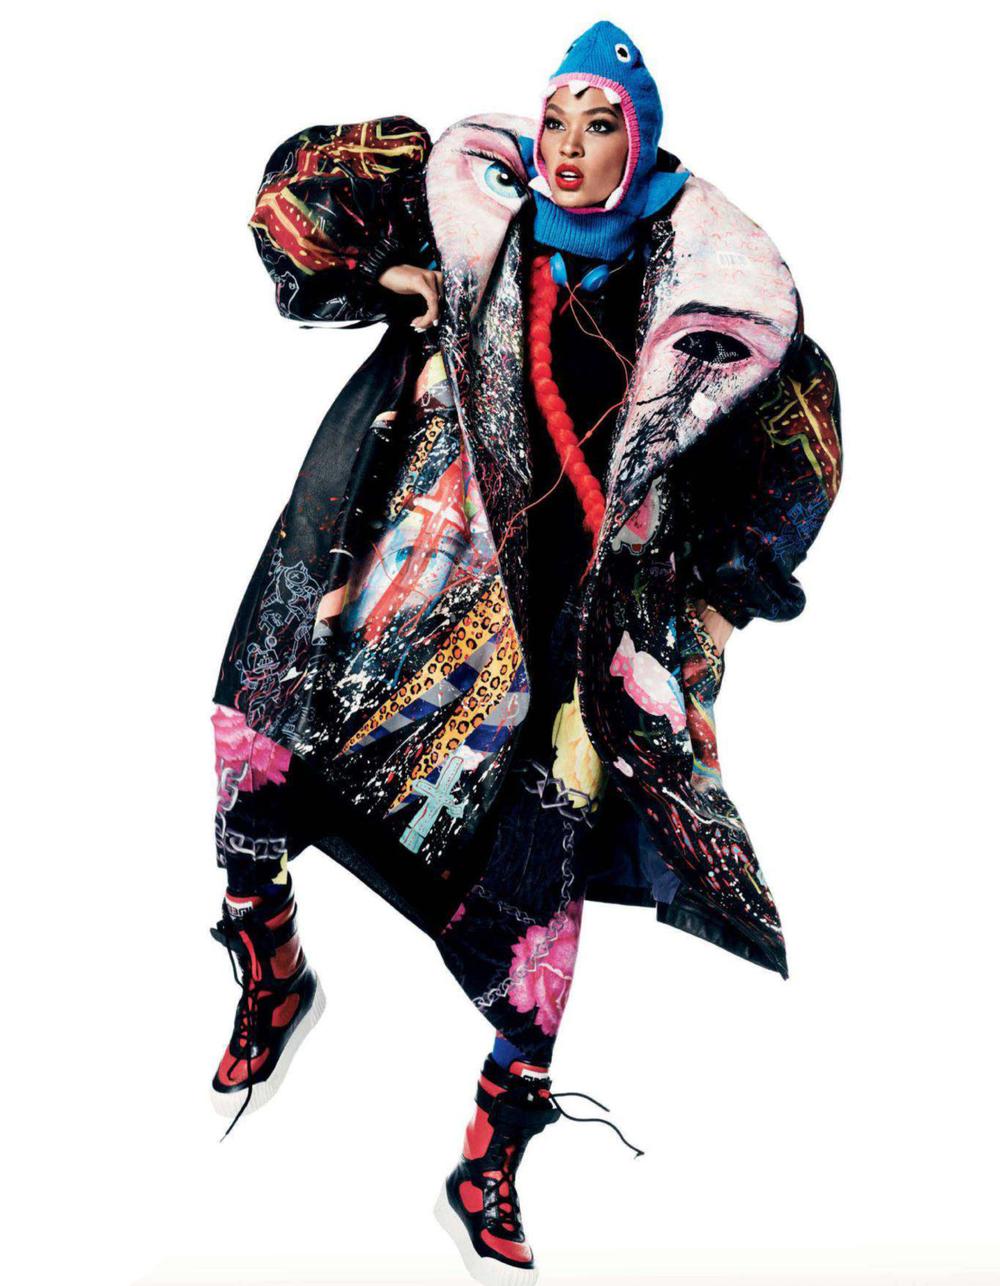 Giampaolo-Sgura-Joan-Smalls-Vogue-Japan-December-2014-5.jpg